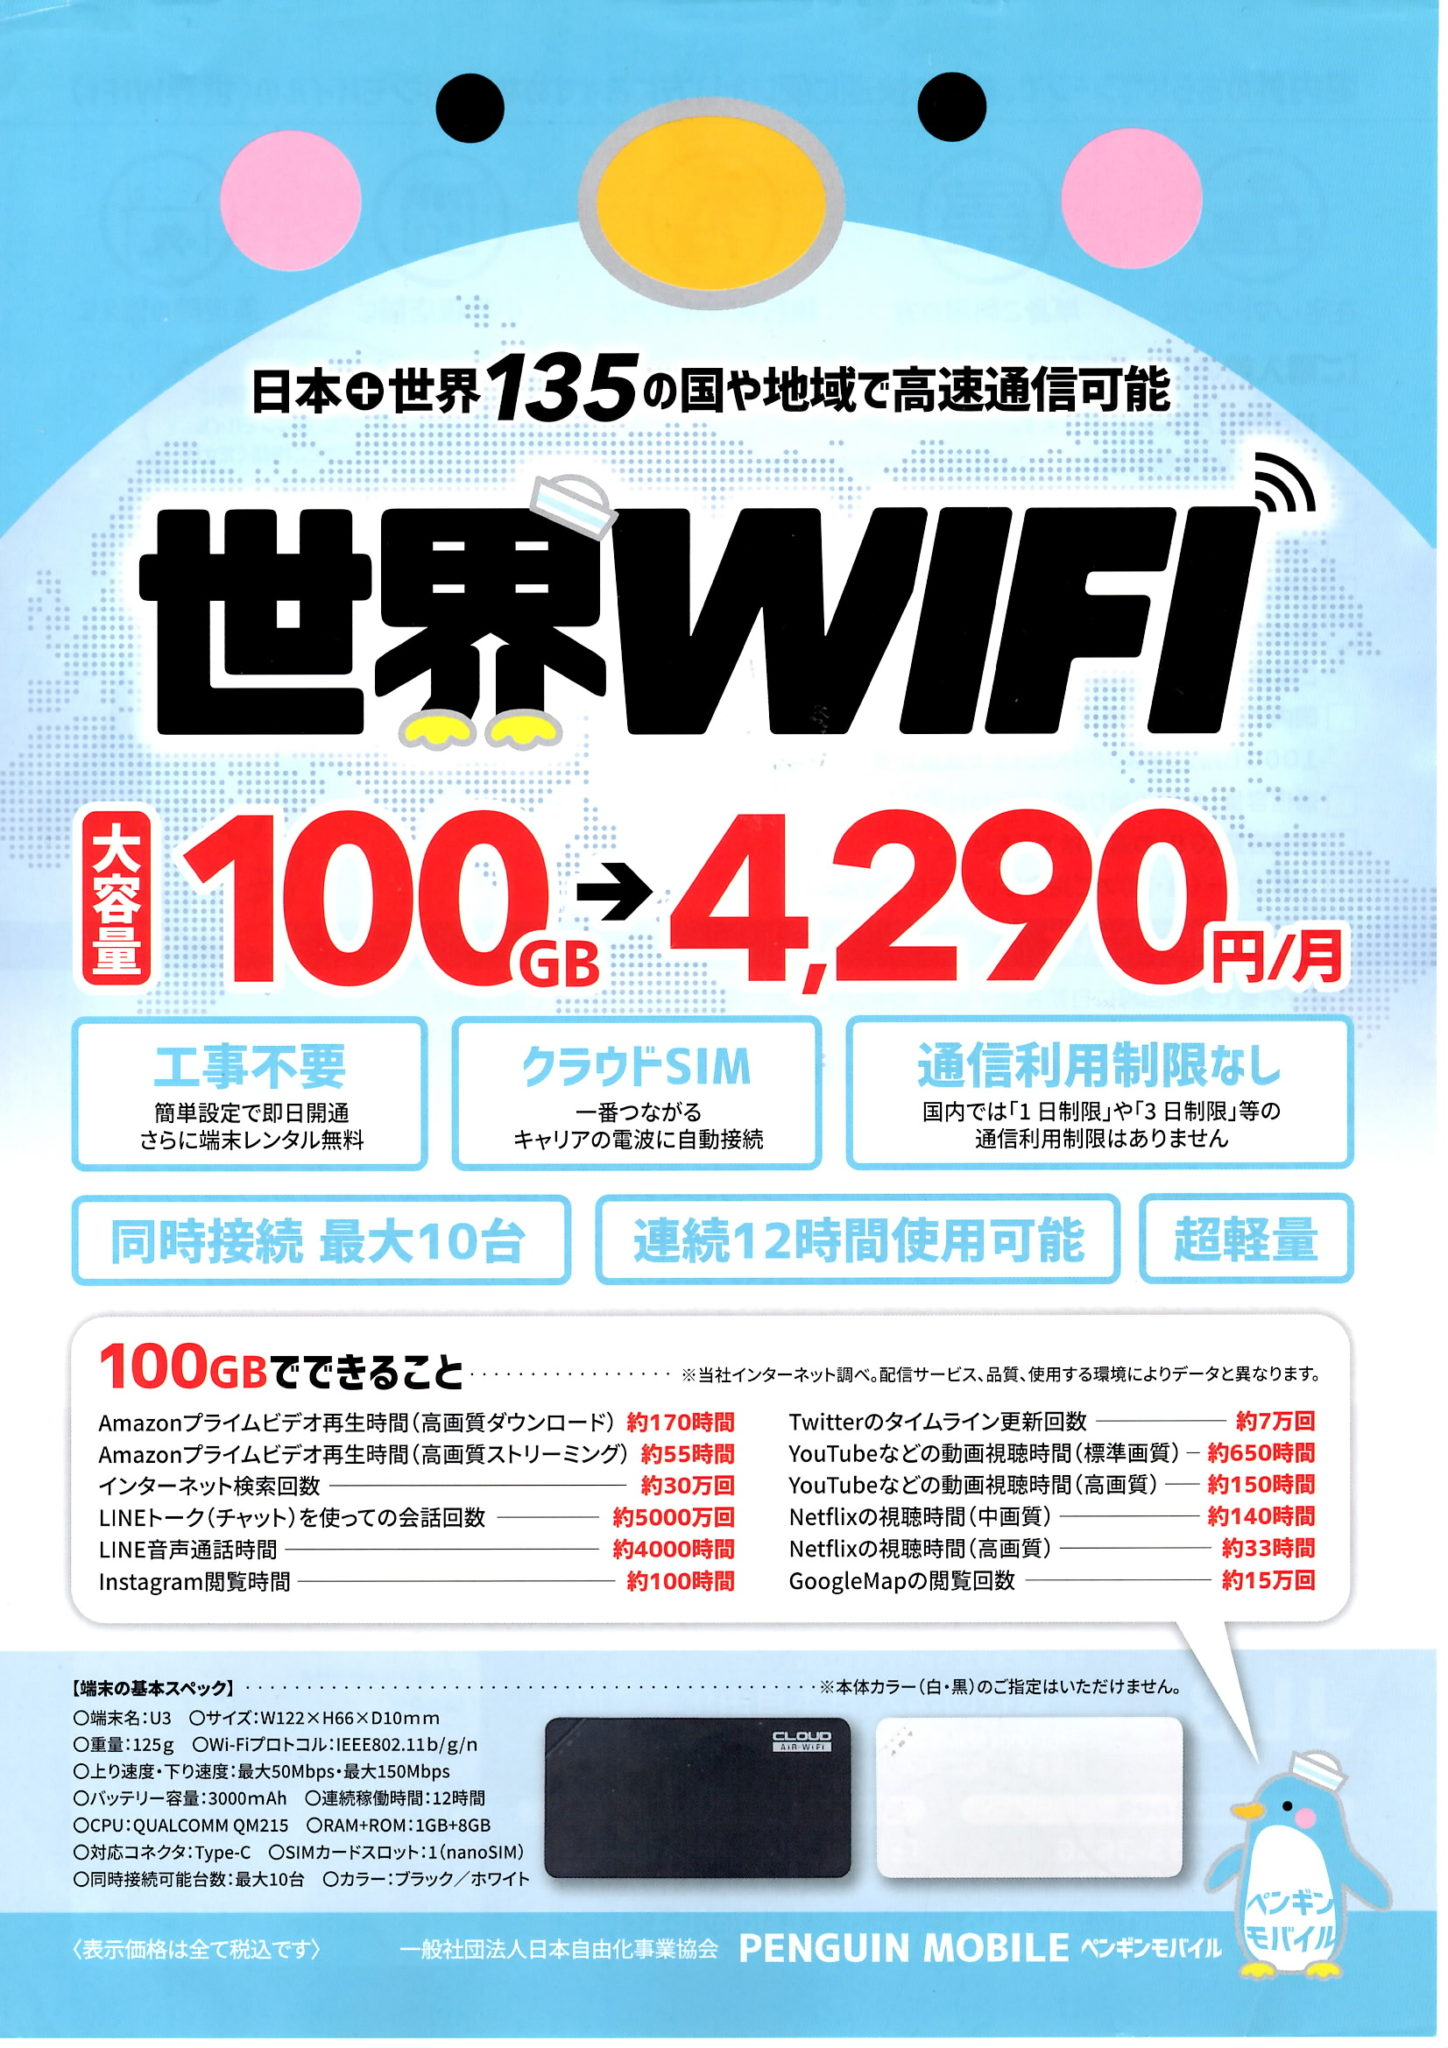 WiFiも月100GB